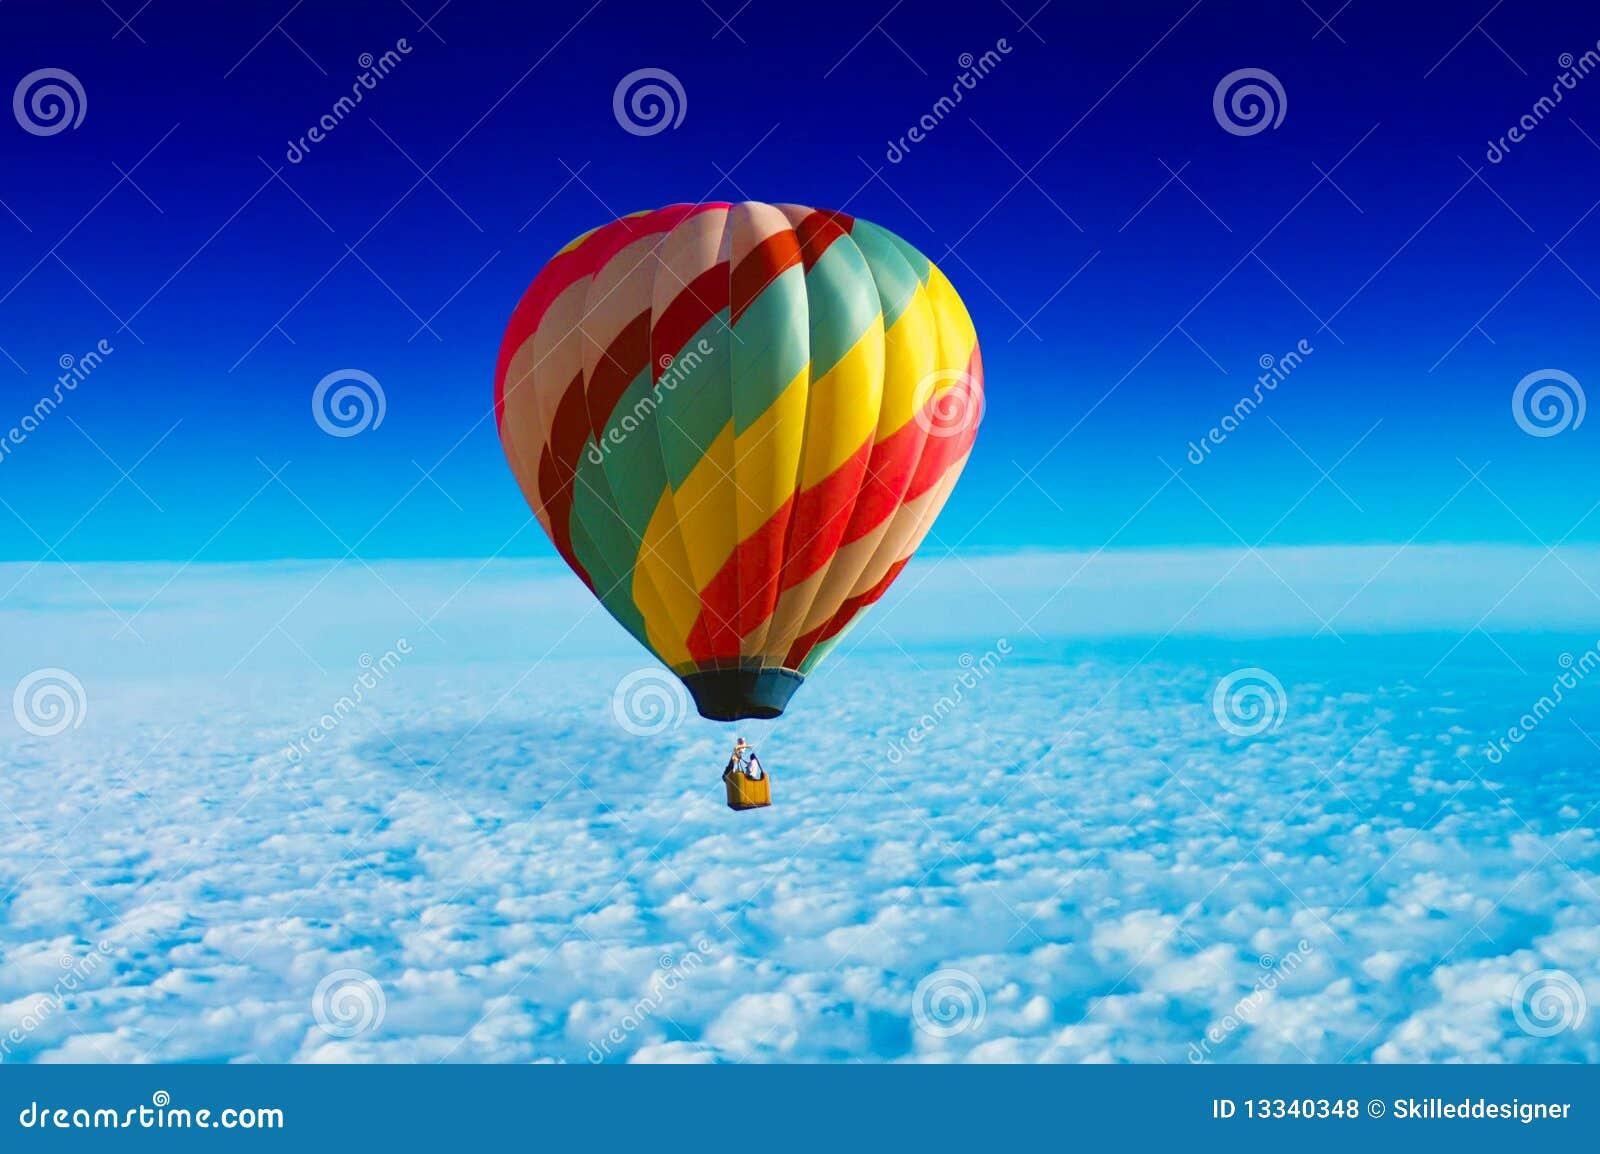 Heißluft-Ballon